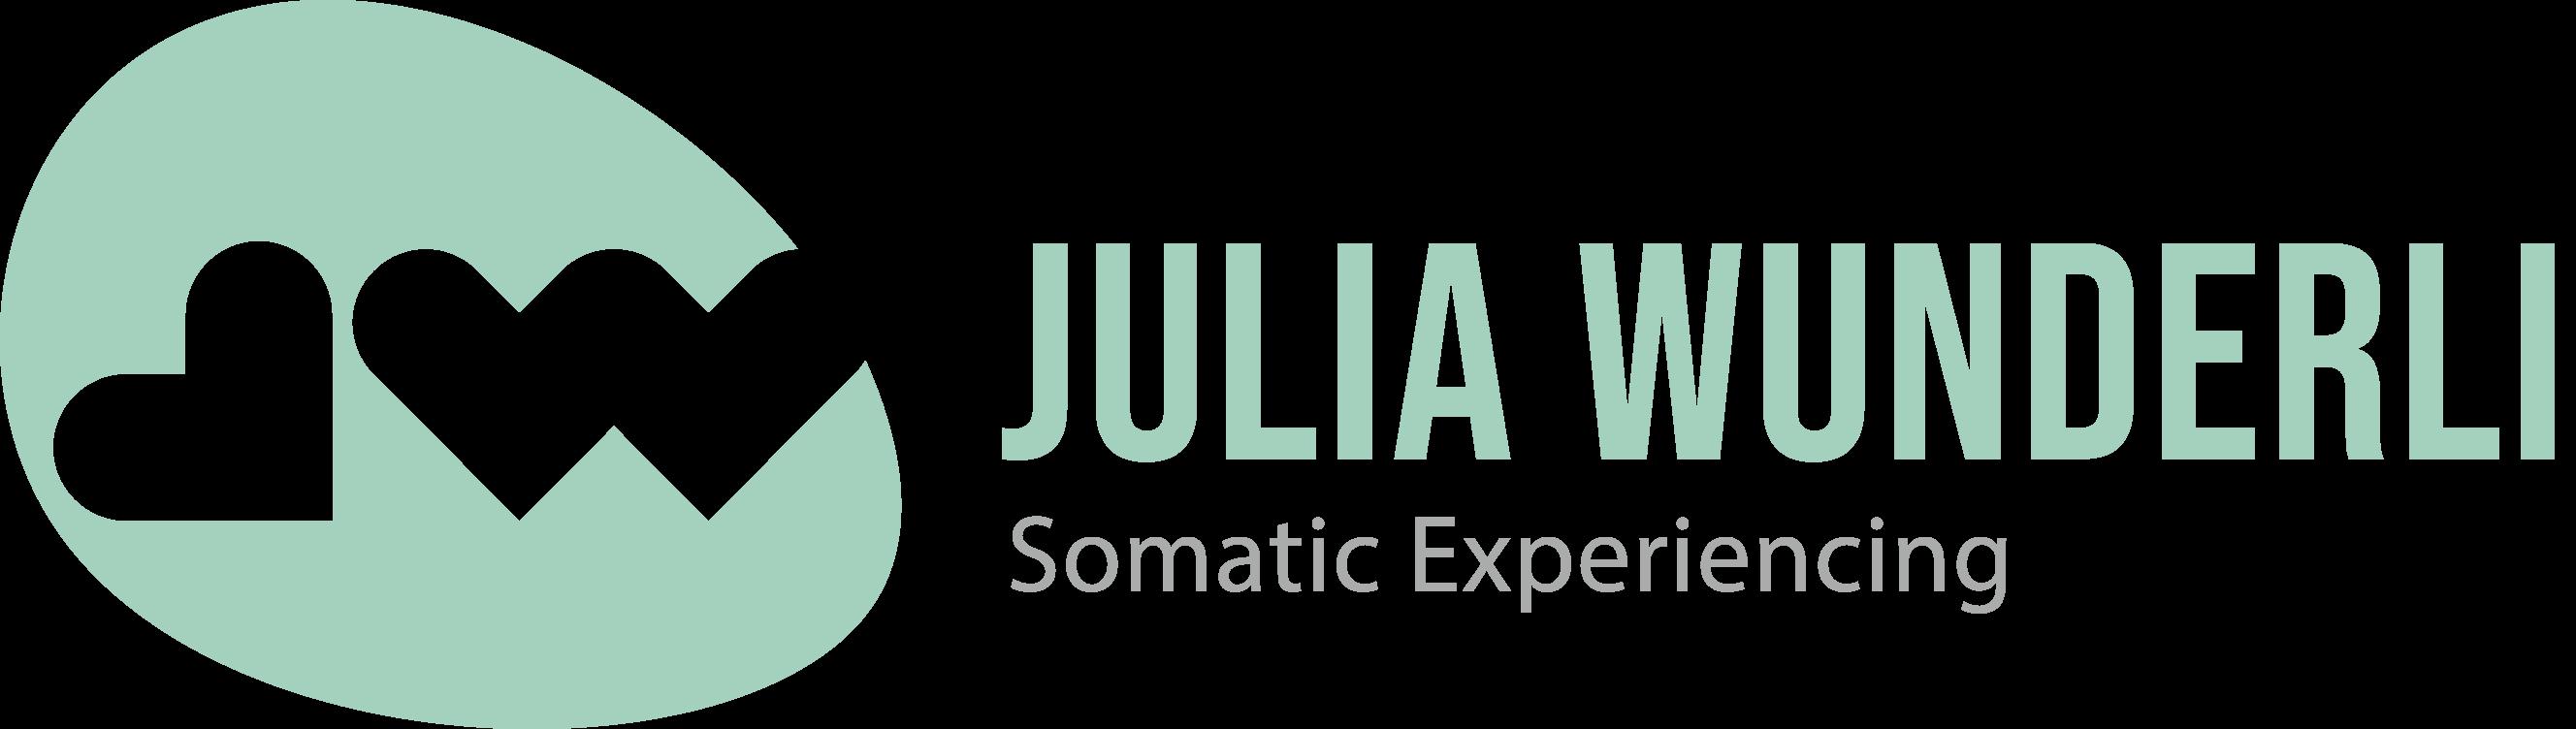 Julia Wunderli - Somatic Experiencing